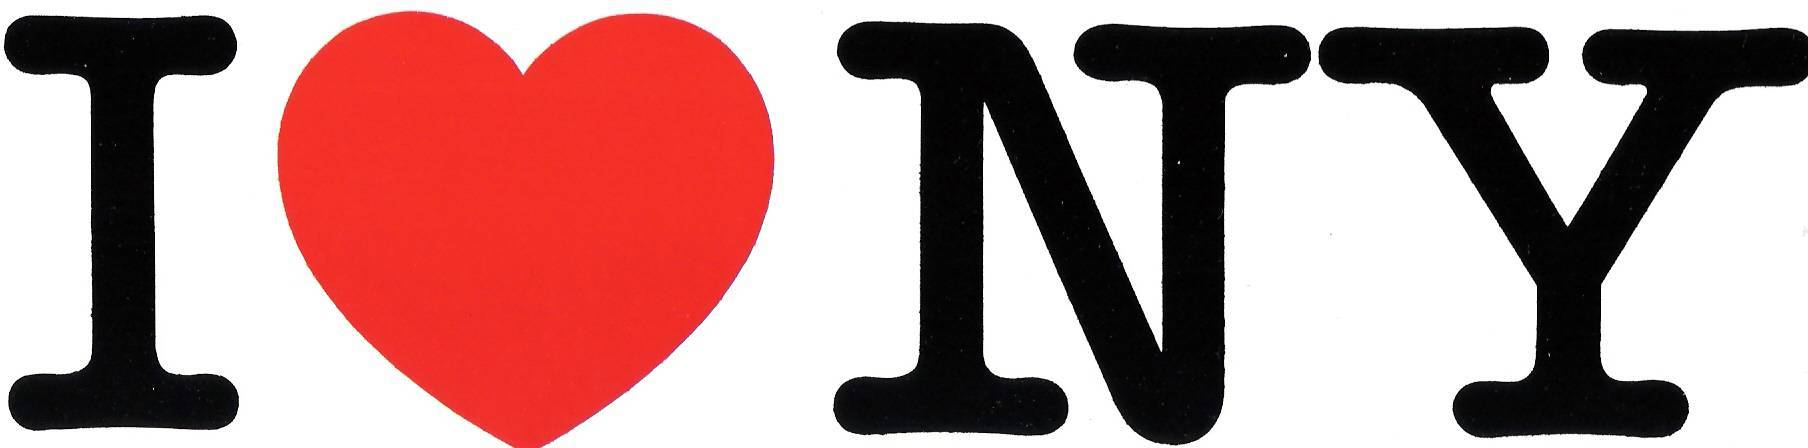 c3ca75b8f31d8d4ffcb9_I-Love-New-York-Logo.jpg